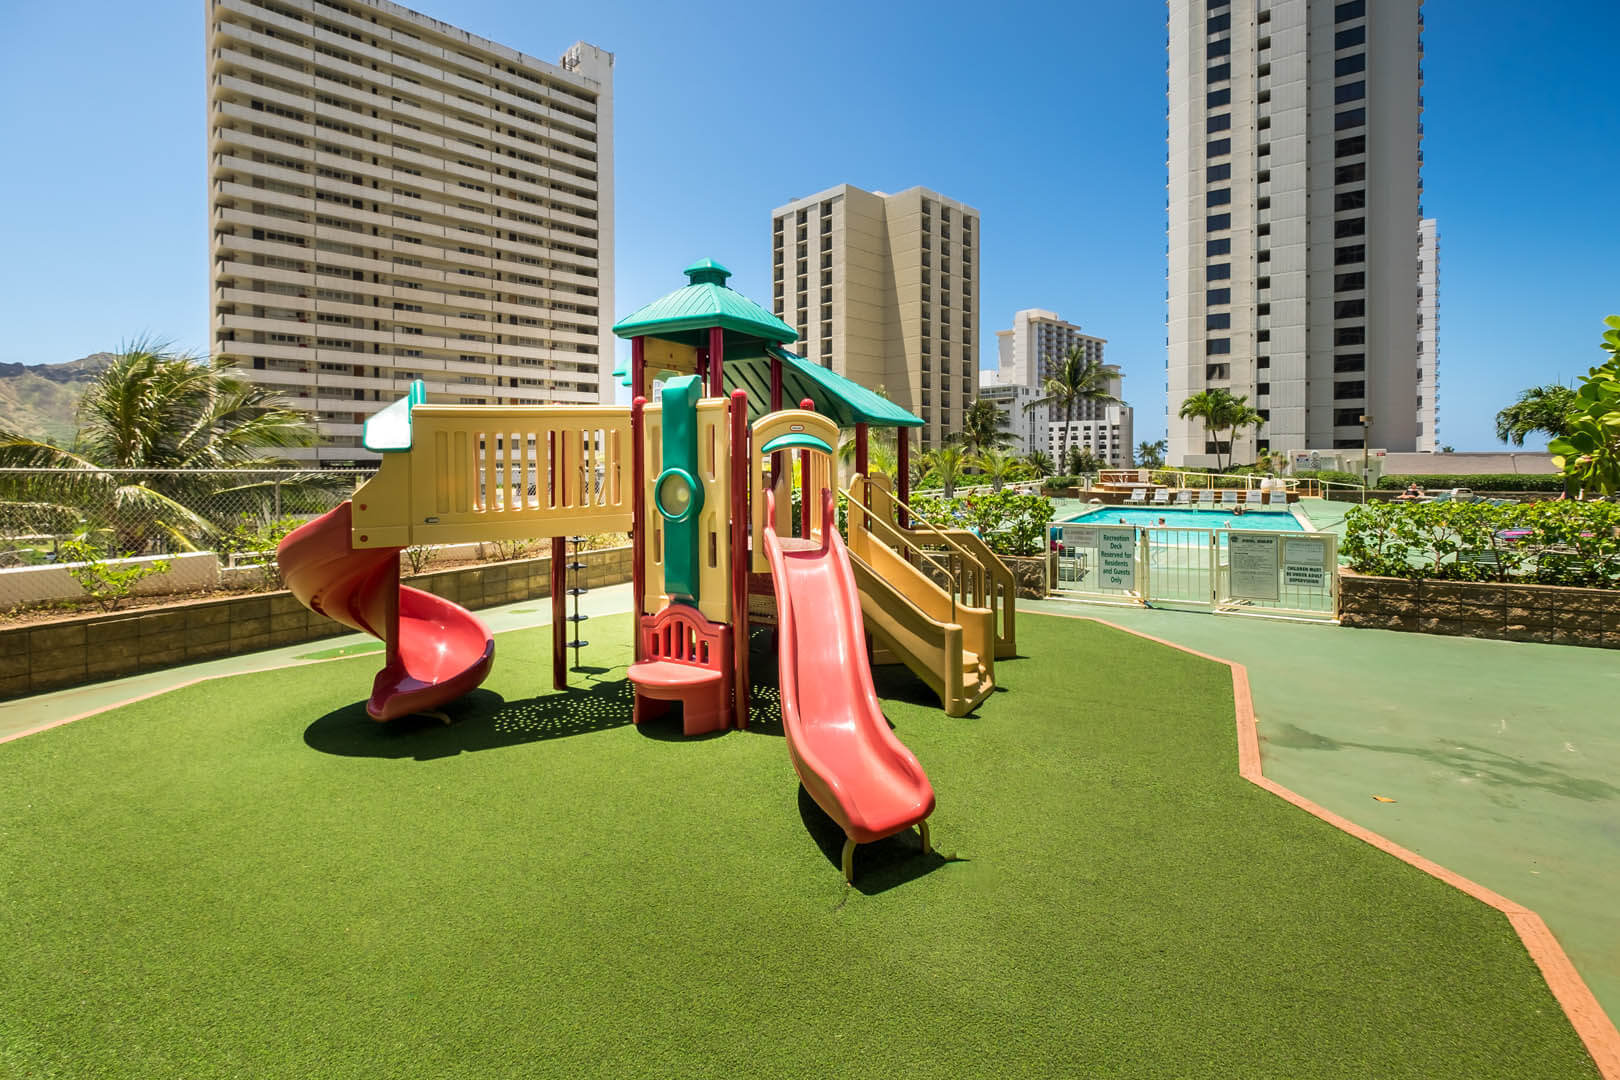 A colorful playground at VRI's Kuleana Club in Lahaina, Maui.